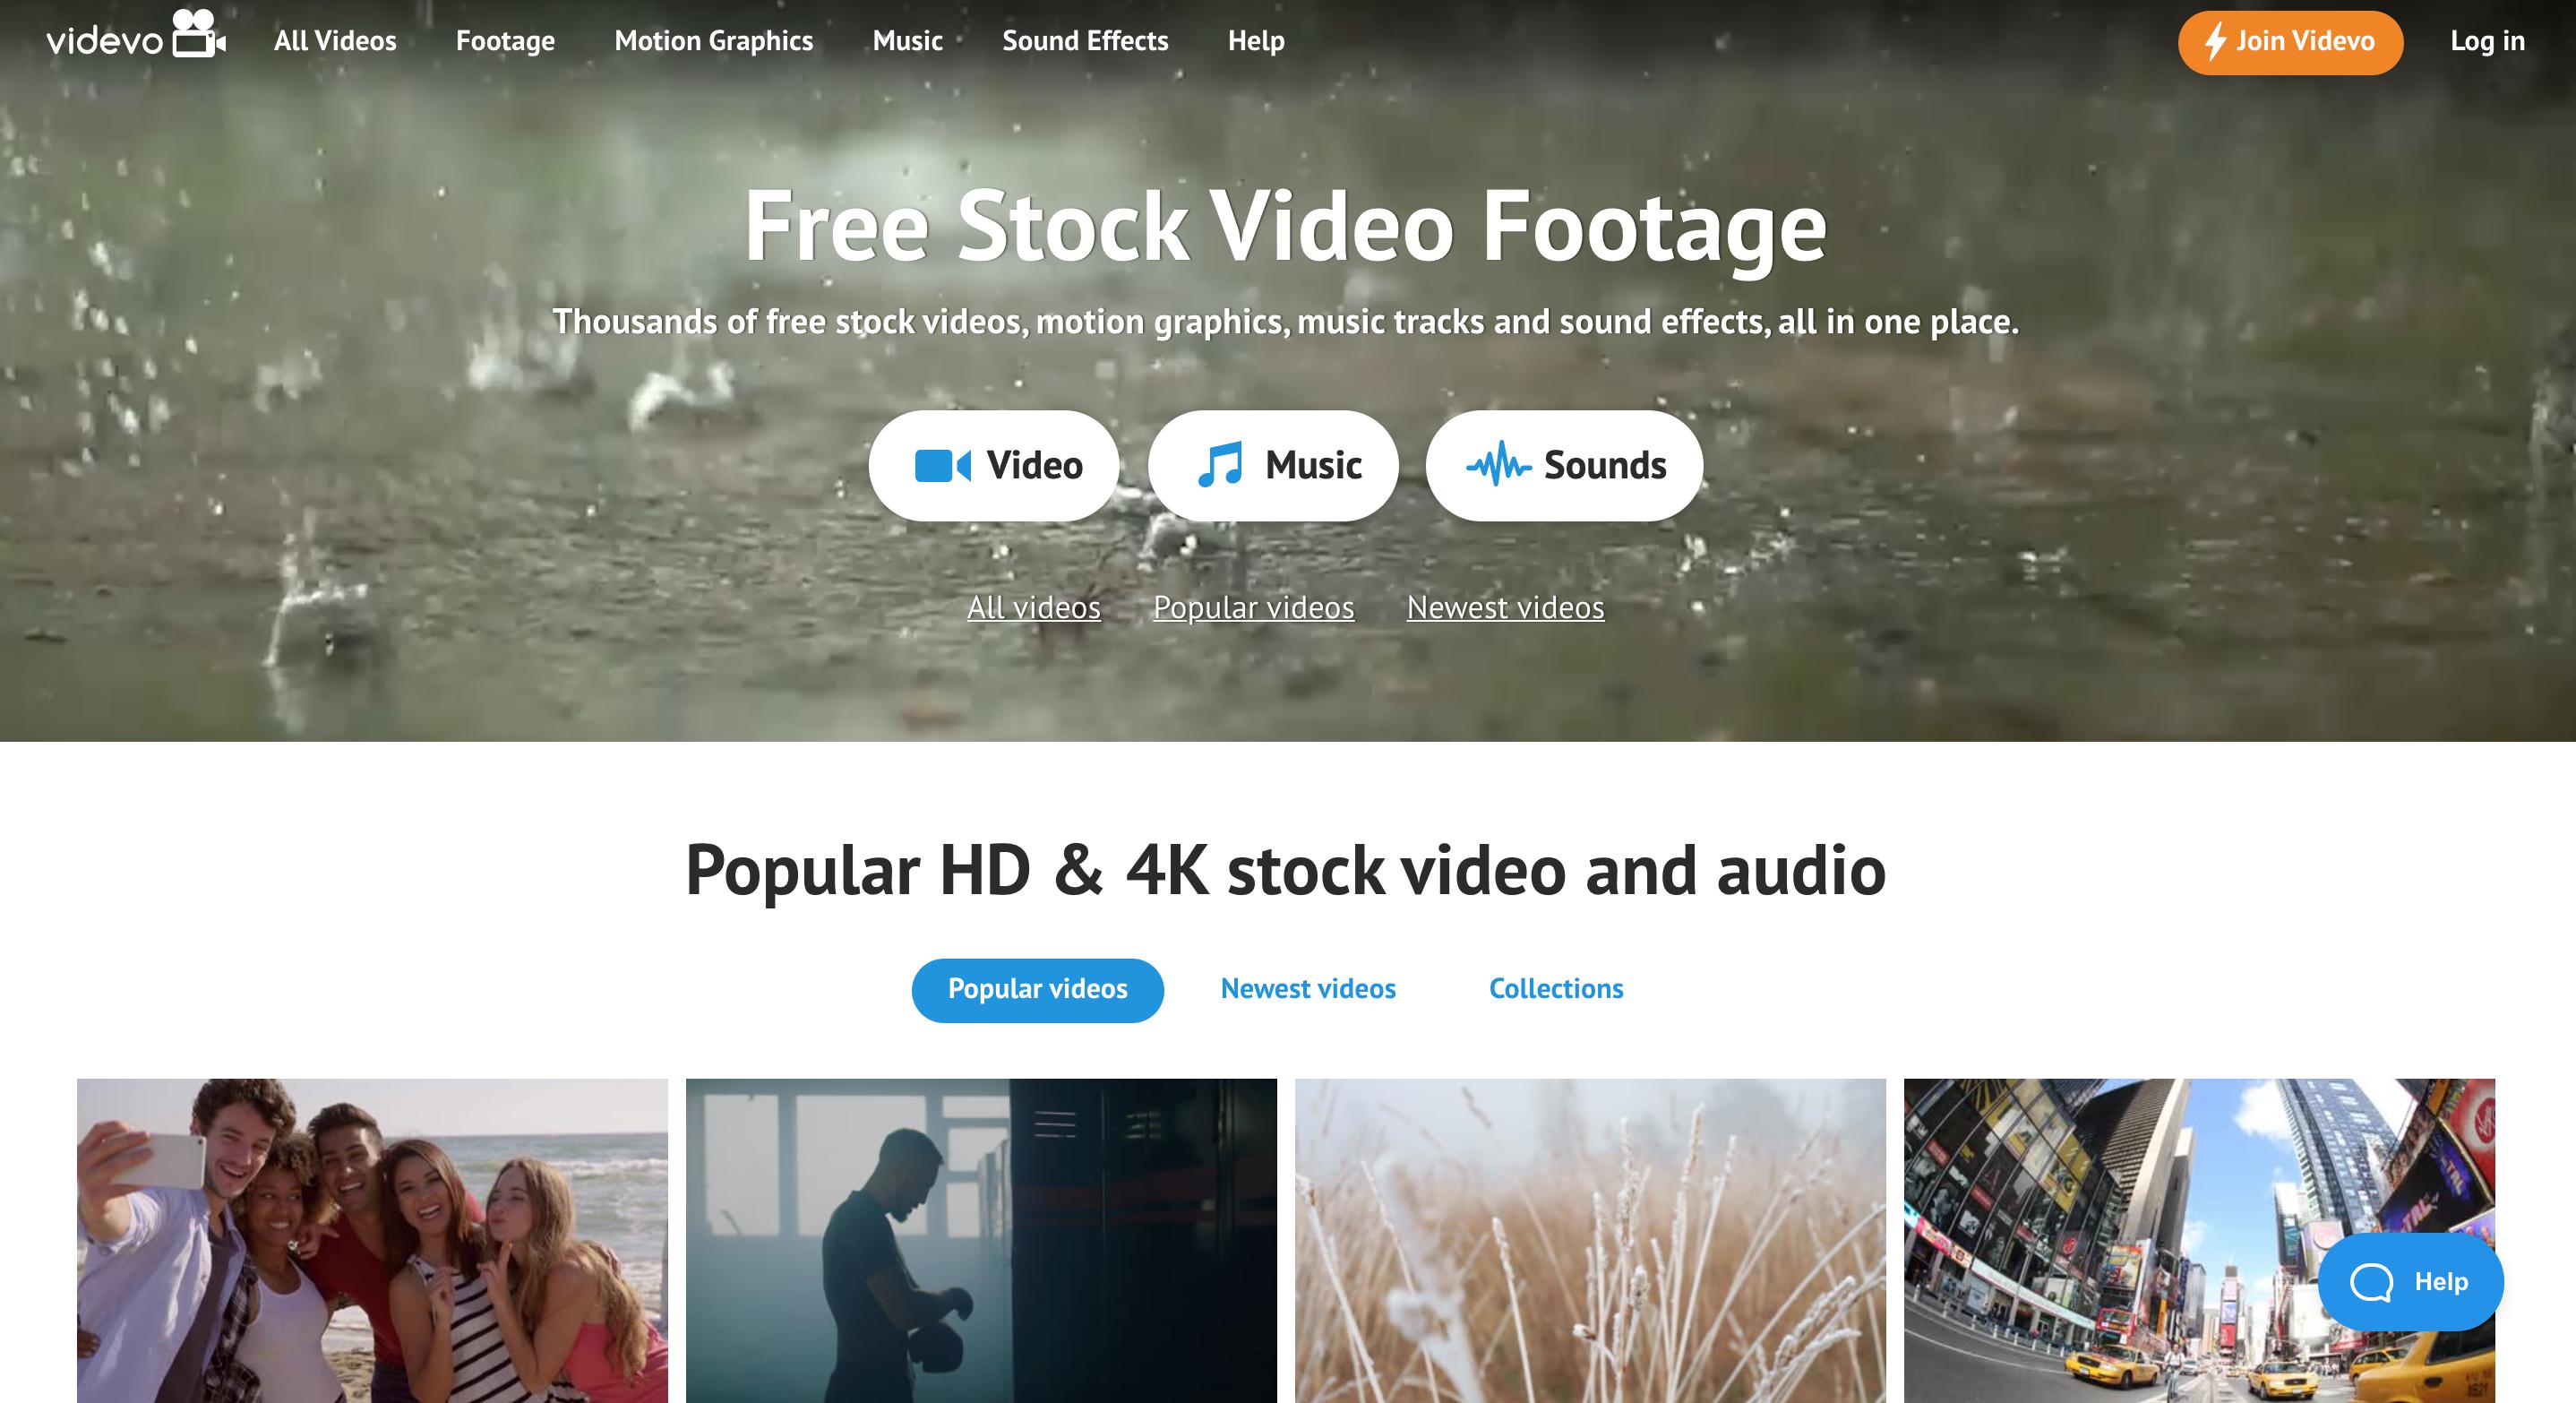 Videvo homepage